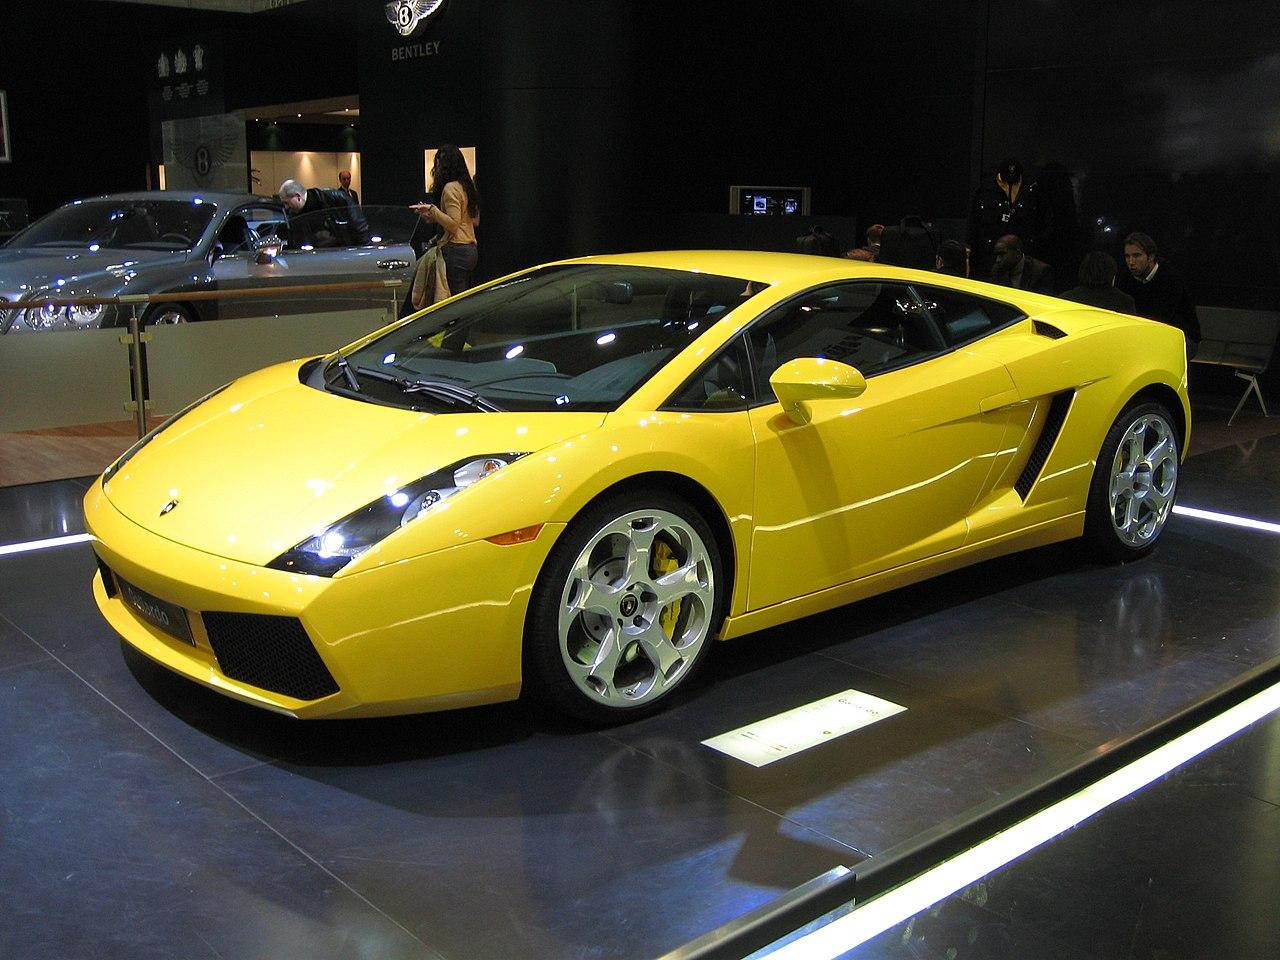 37 best lamborghini gallardo images on pinterest lamborghini gallardo image and dream cars